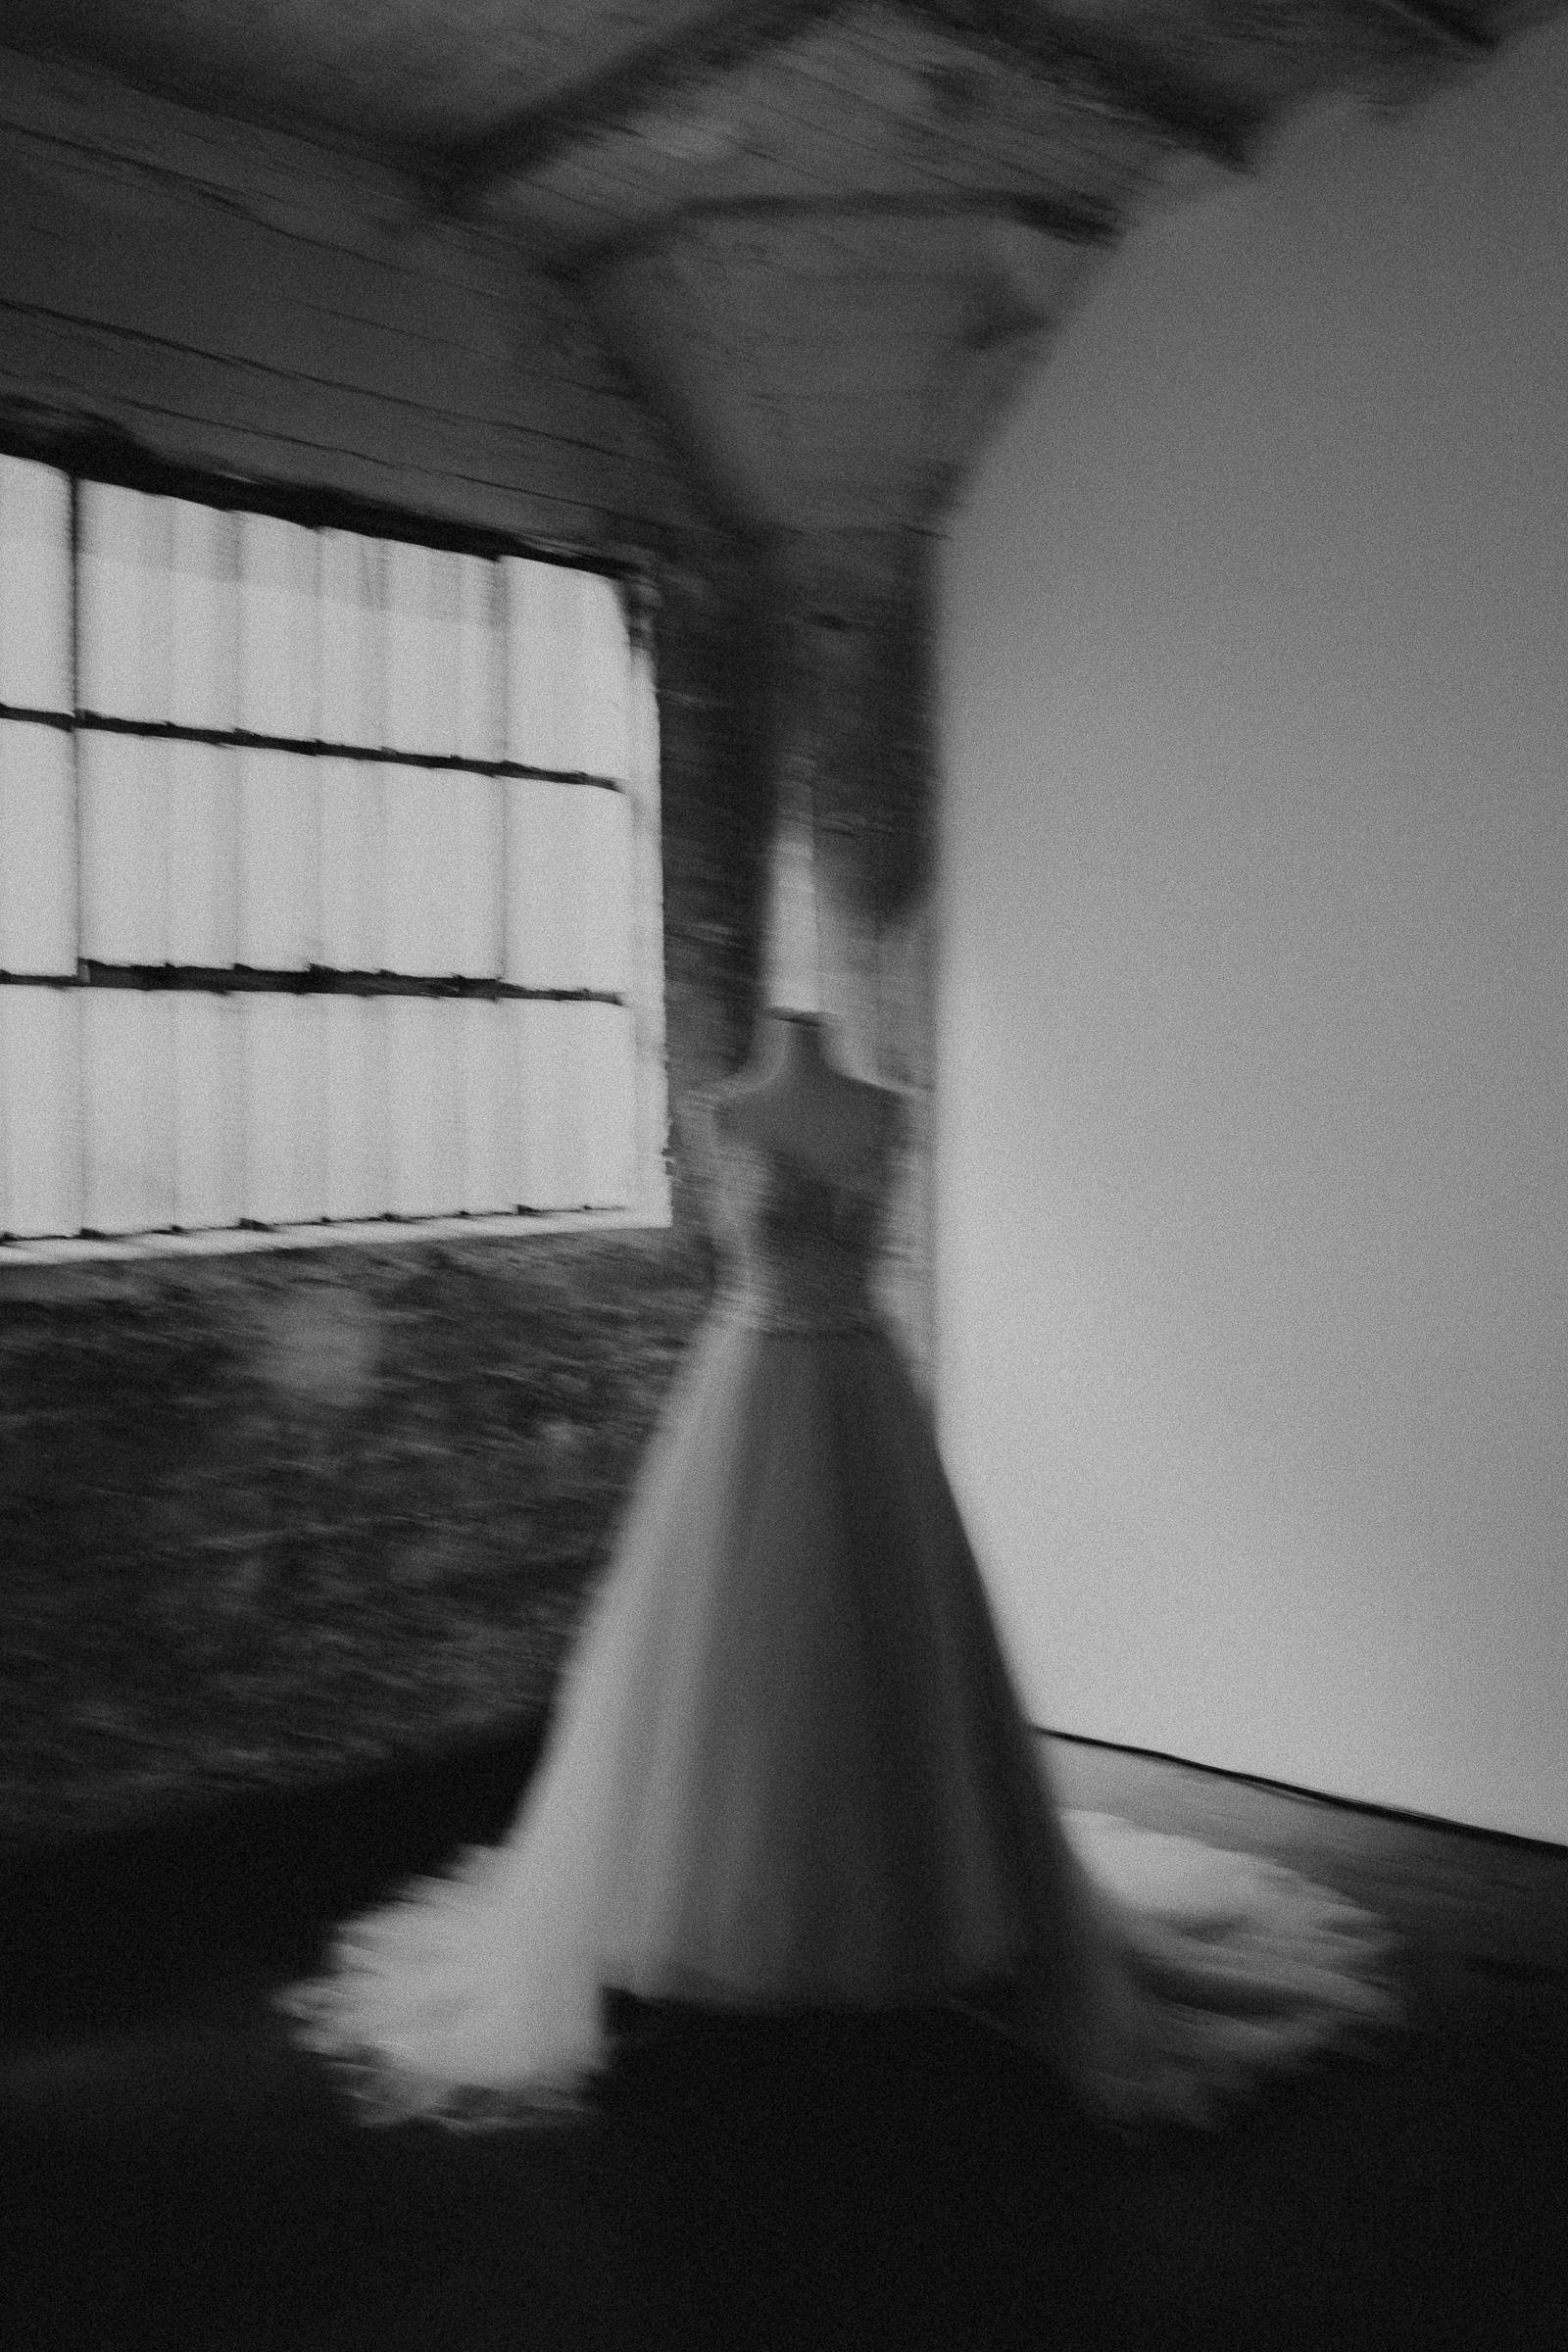 Gretchen Gause Photography | Los Angeles Hudson Loft Wedding #hudsonloft #laweddingphotographer #DTLA #weddingplanning #romanticwedding #rooftopwedding #weddingphotography #weddingdress